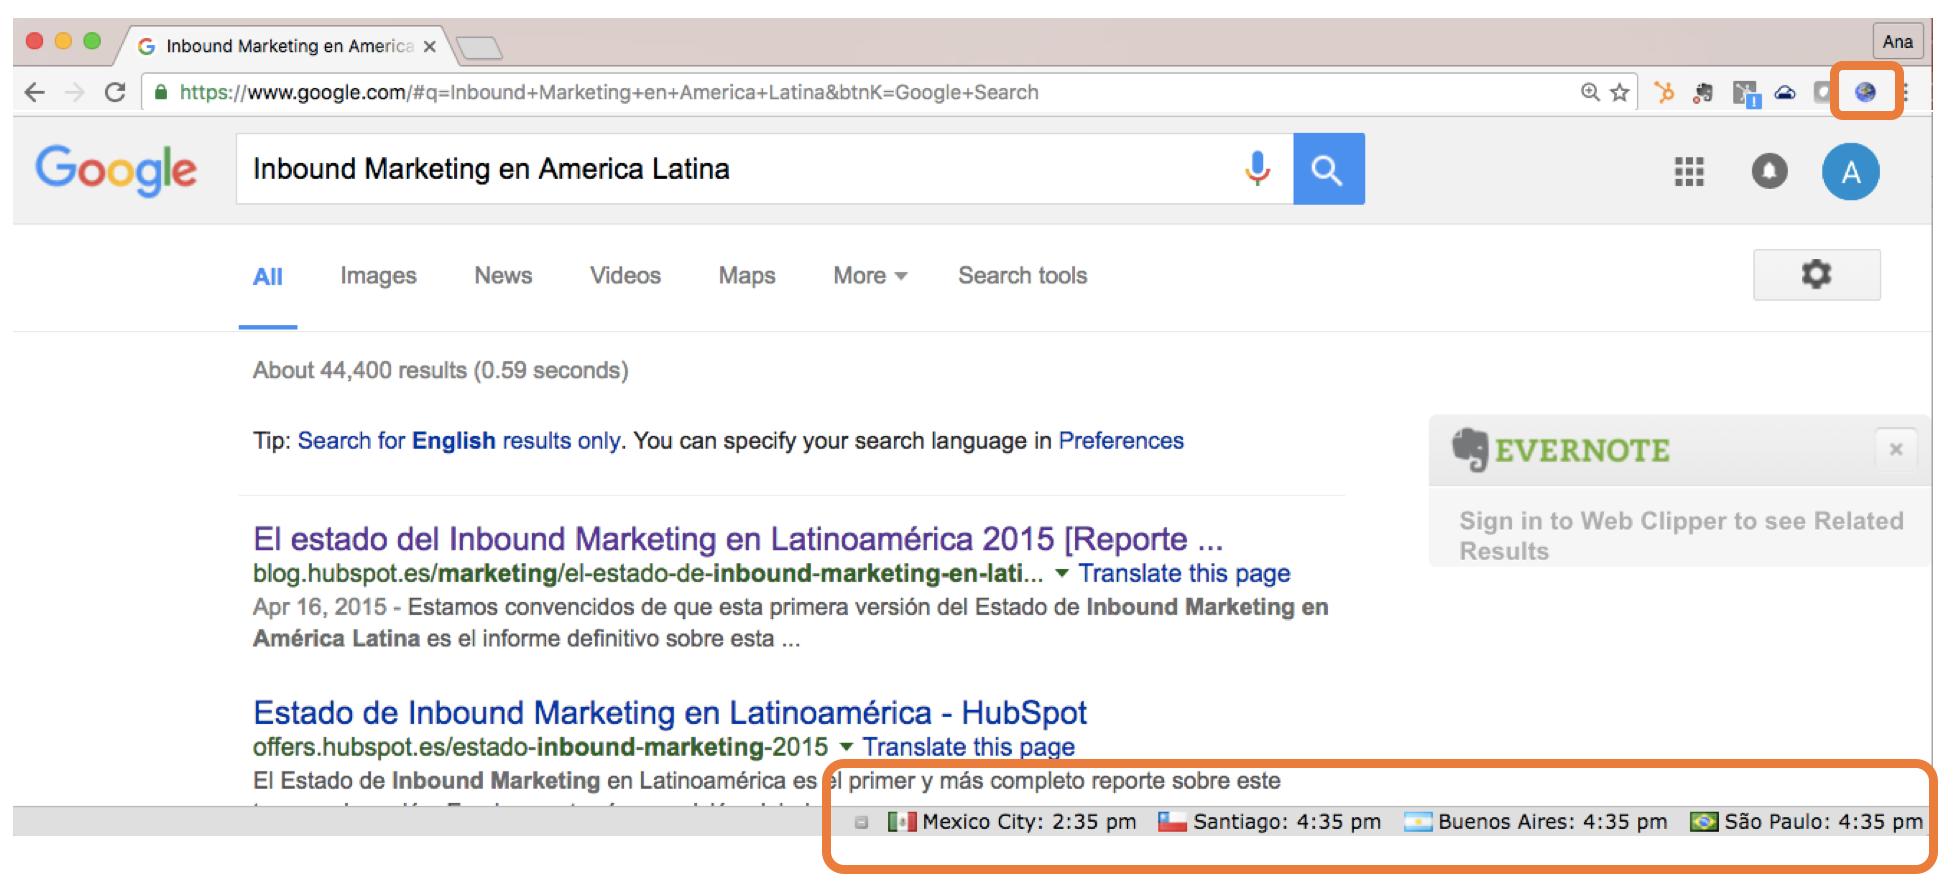 Usos_horarios_Latinoamerica.png